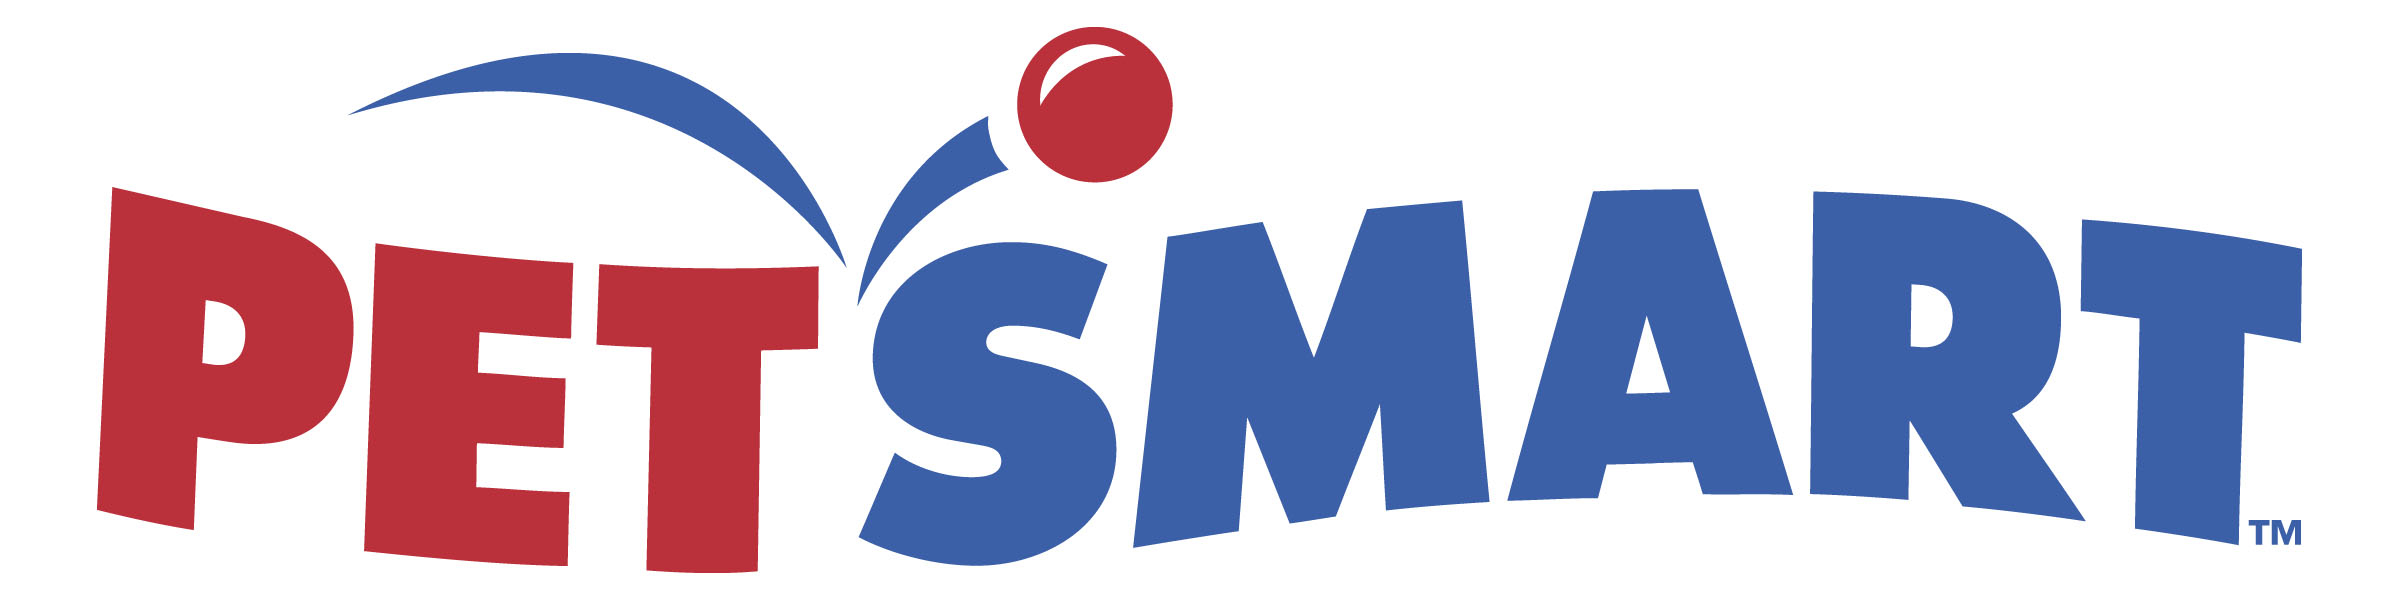 Online Pet Store - logo